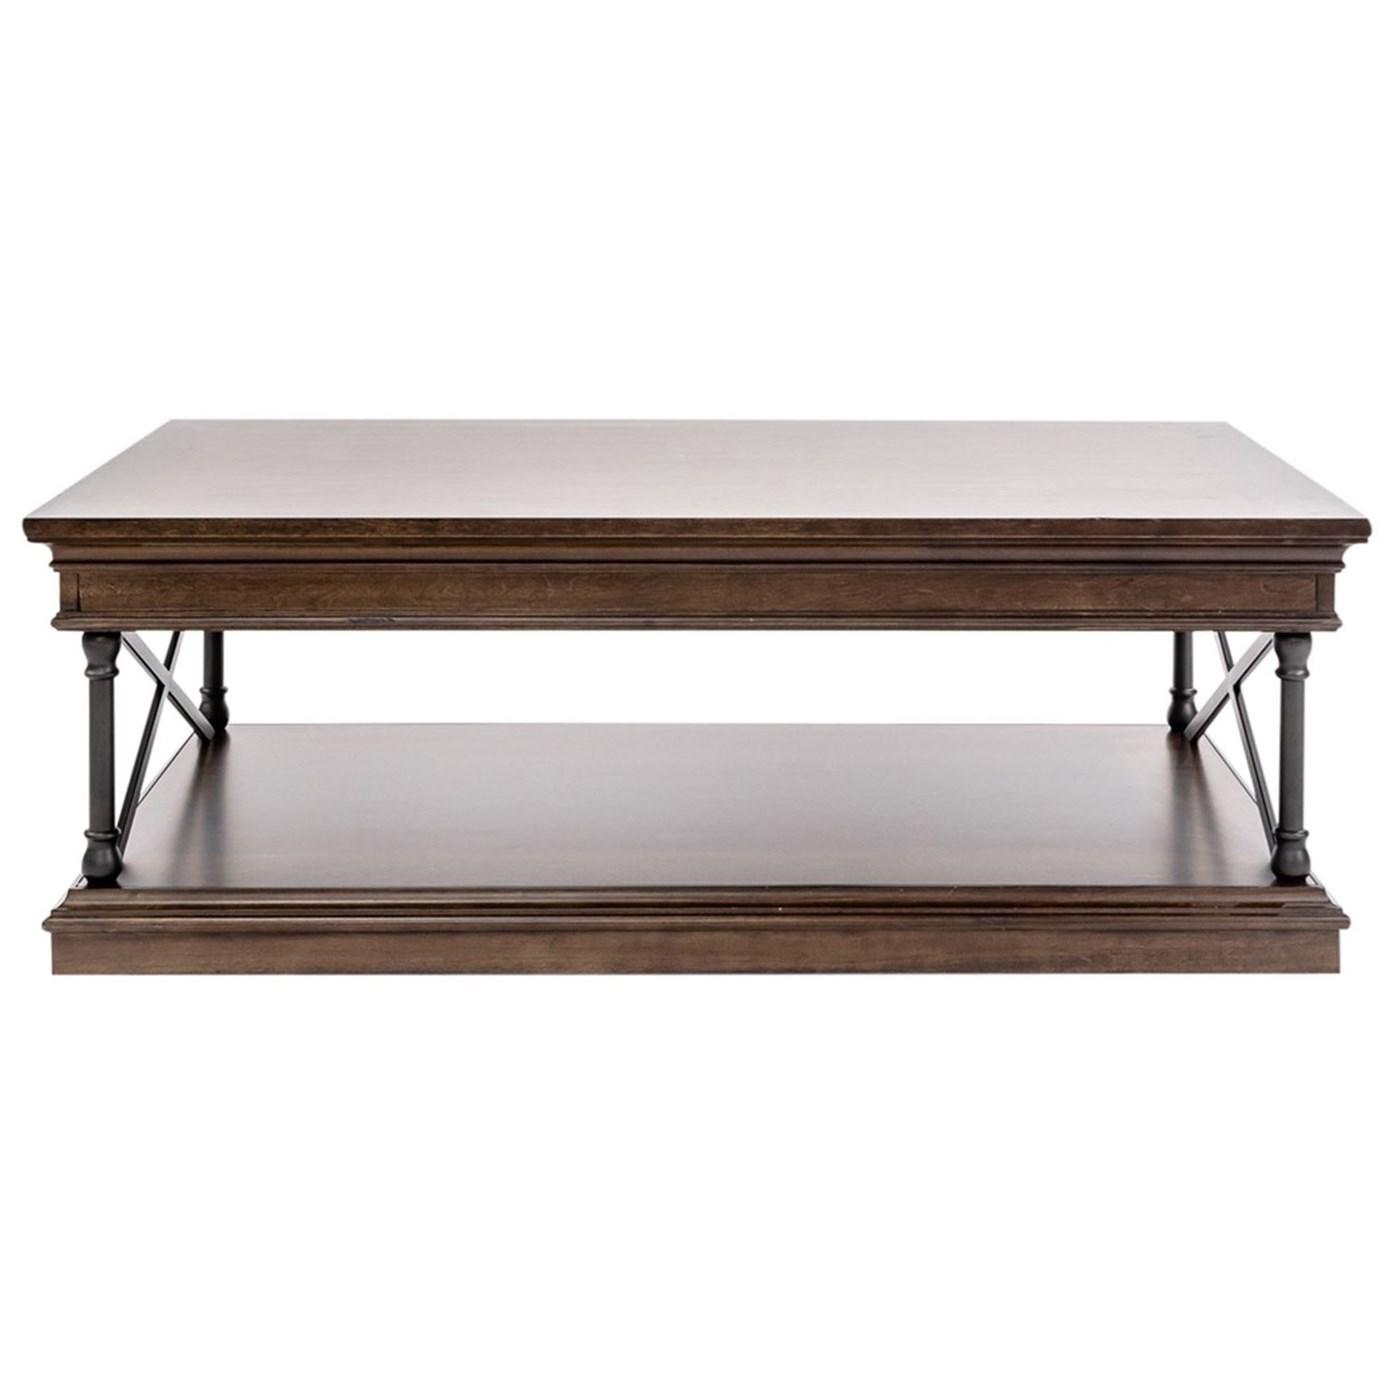 Metal/Wood Rectangular Cocktail Table